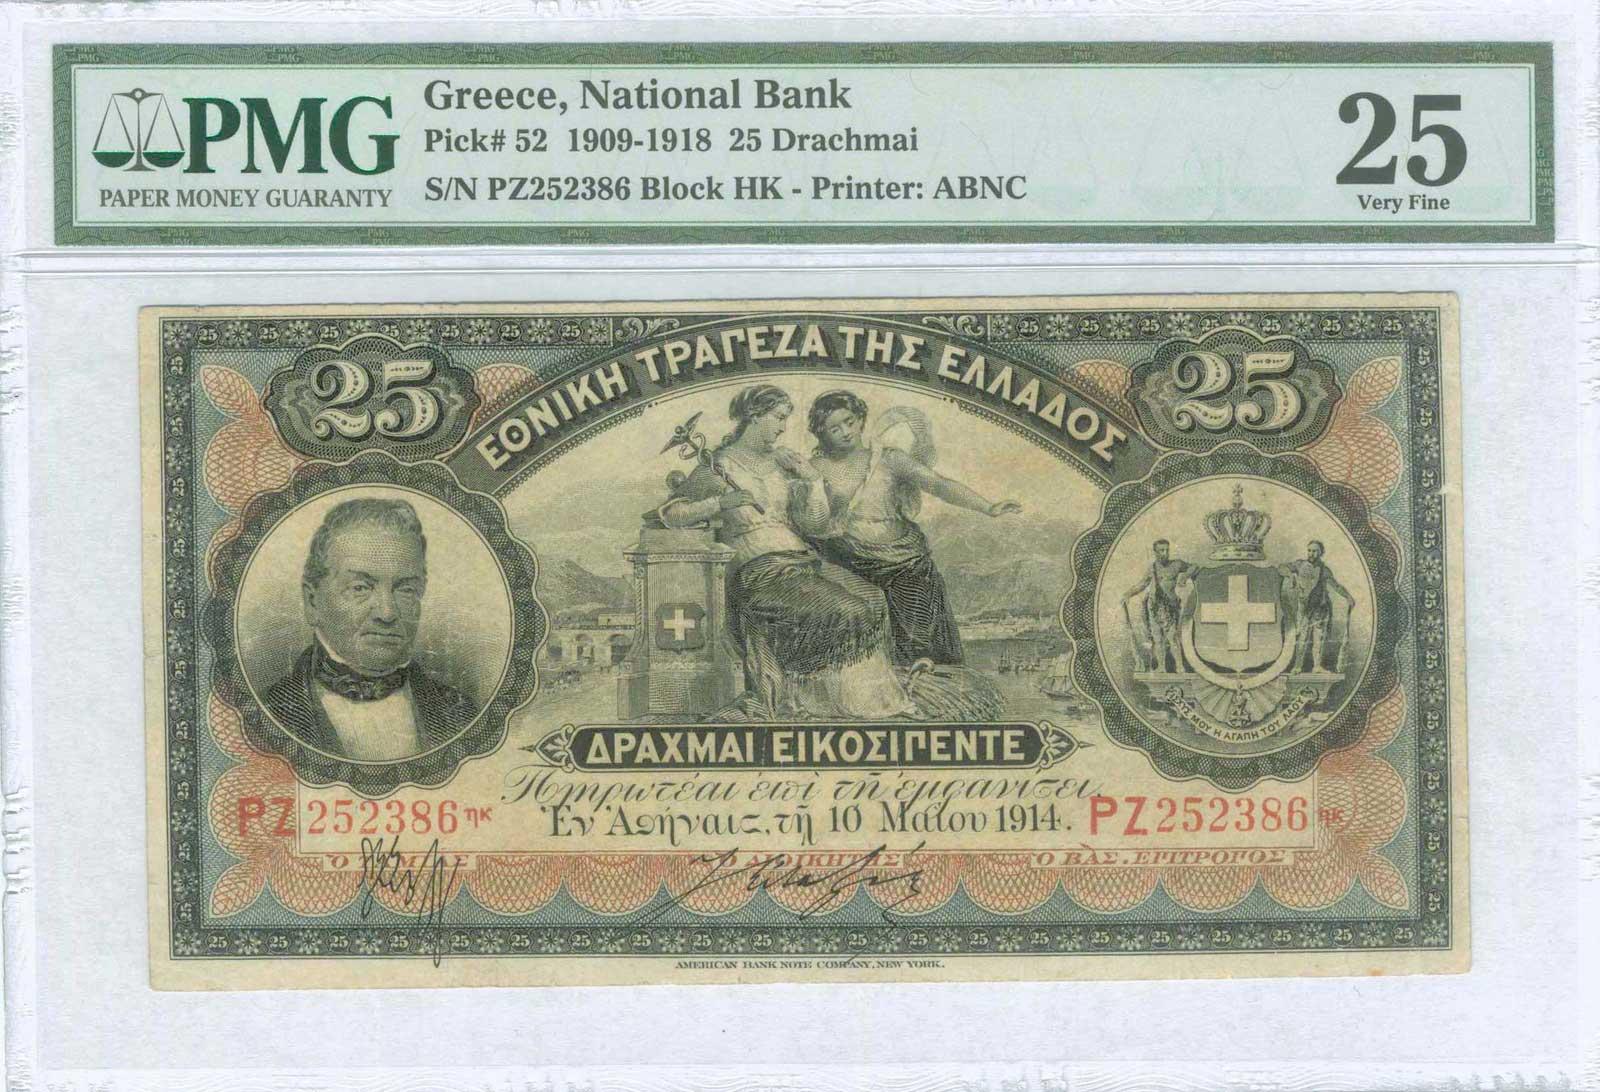 Lot 9258 - GREECE-  PAPER MONEY - BANKNOTES National Bank of Greece -  A. Karamitsos Public & LIVE Bid Auction 610 Coins, Medals & Banknotes